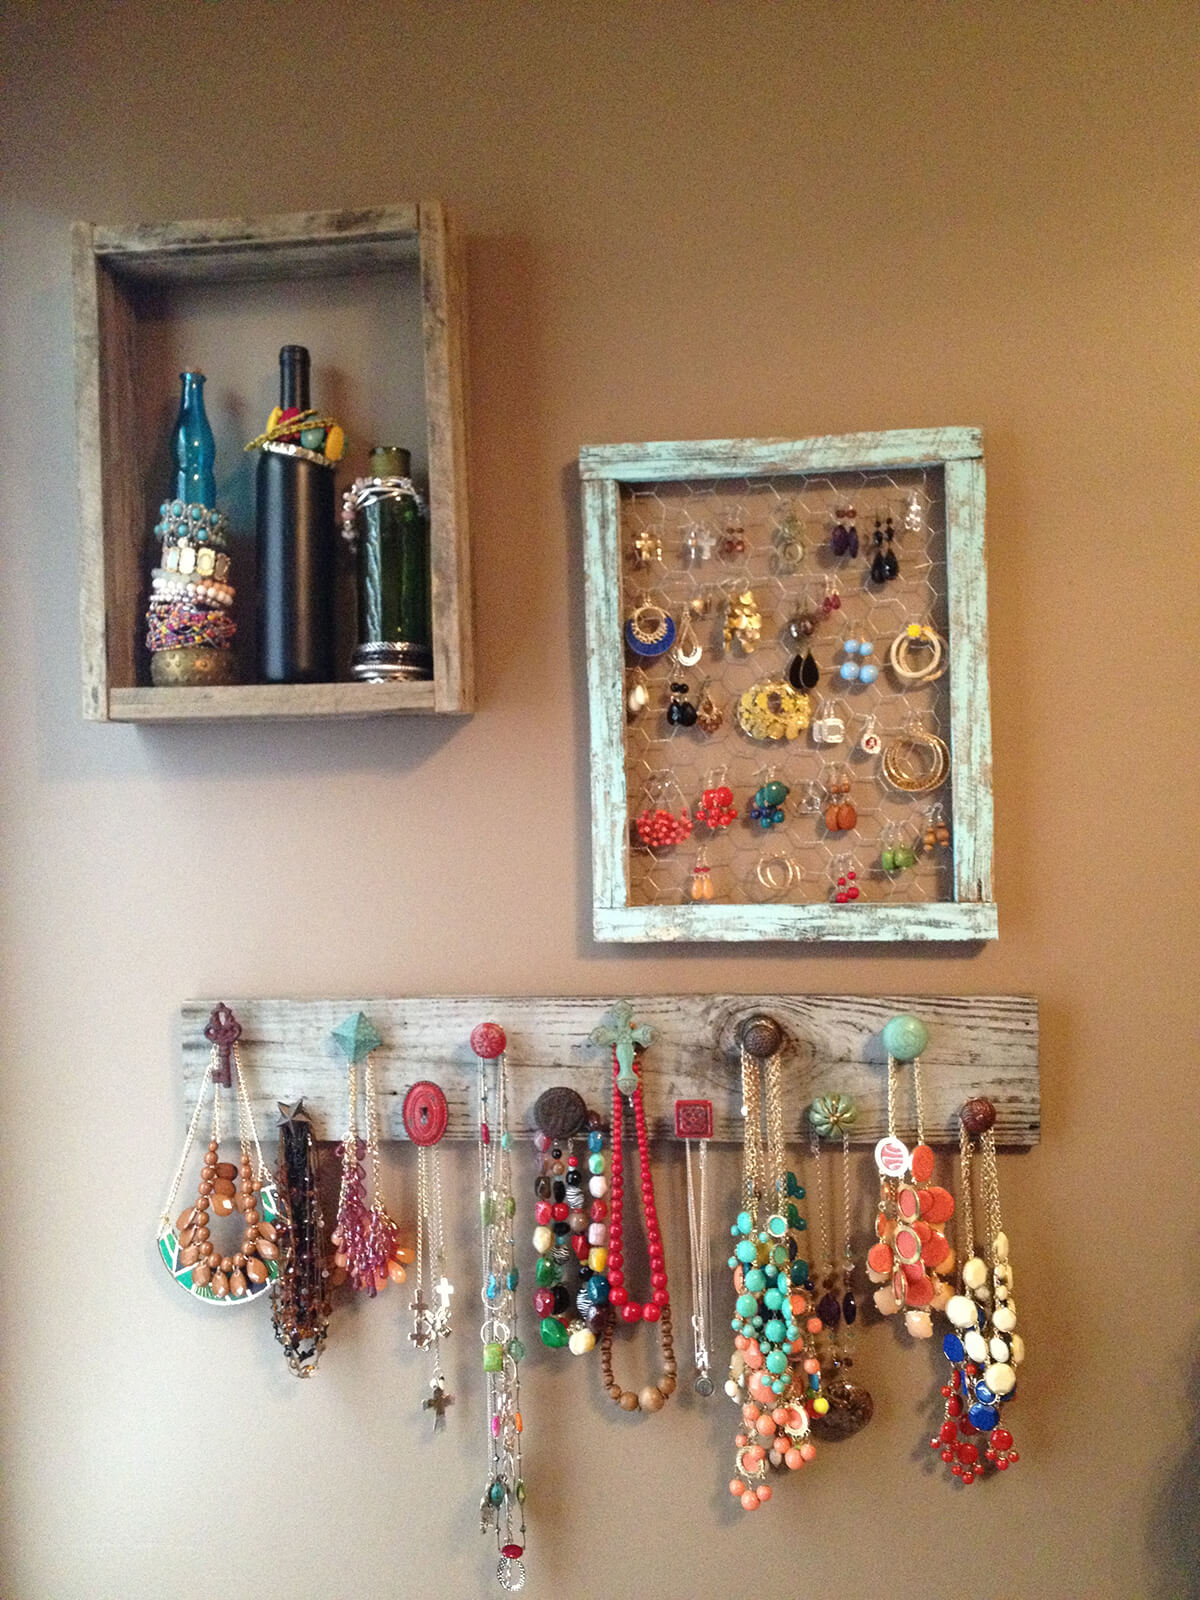 Mixed Barn Wood Jewelry Wall Displays